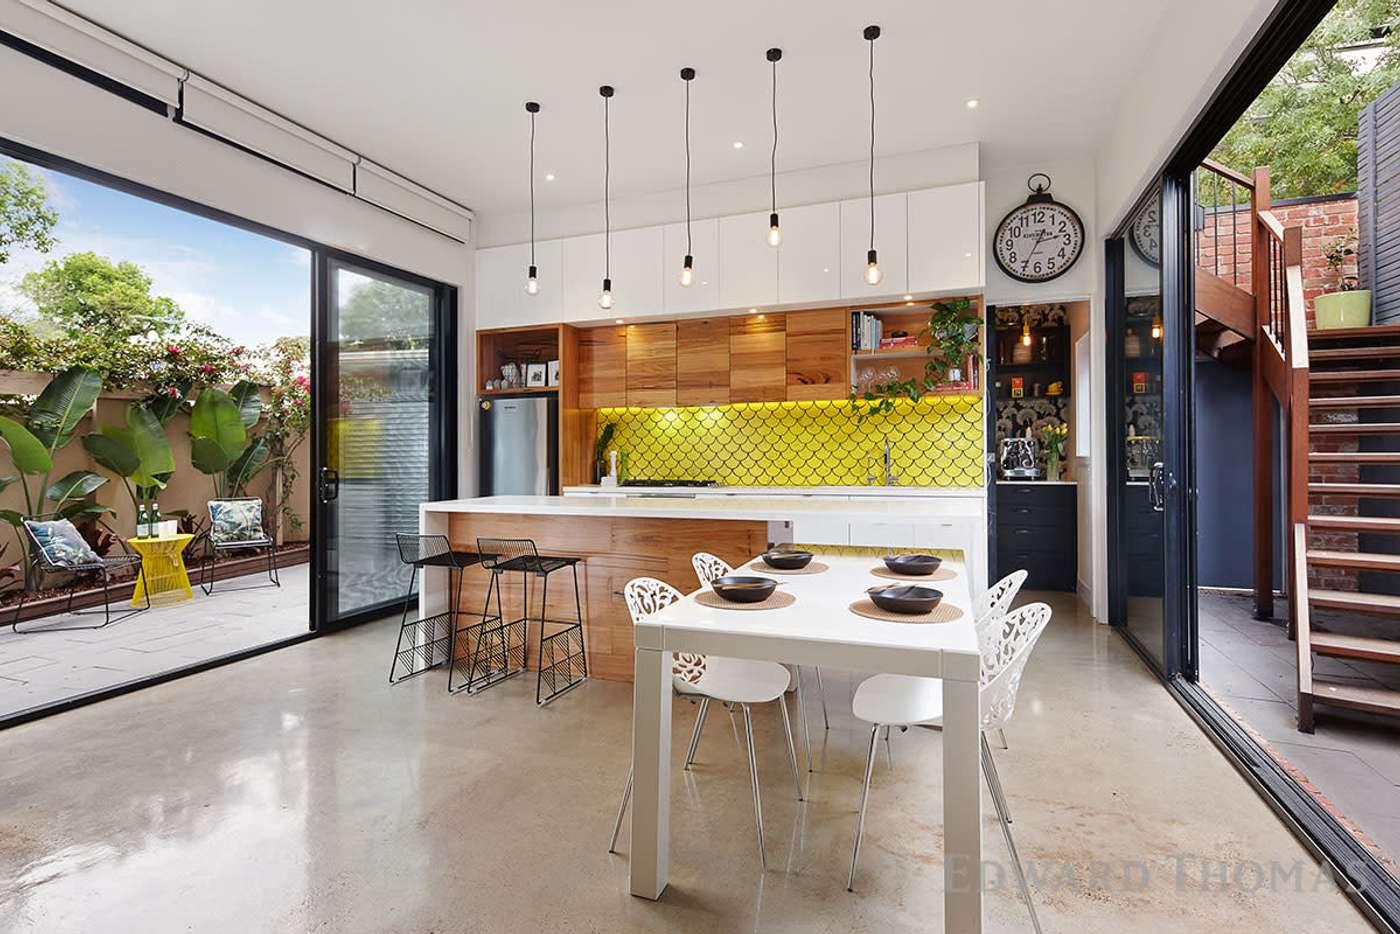 Sixth view of Homely house listing, 548 Macaulay Road, Kensington VIC 3031